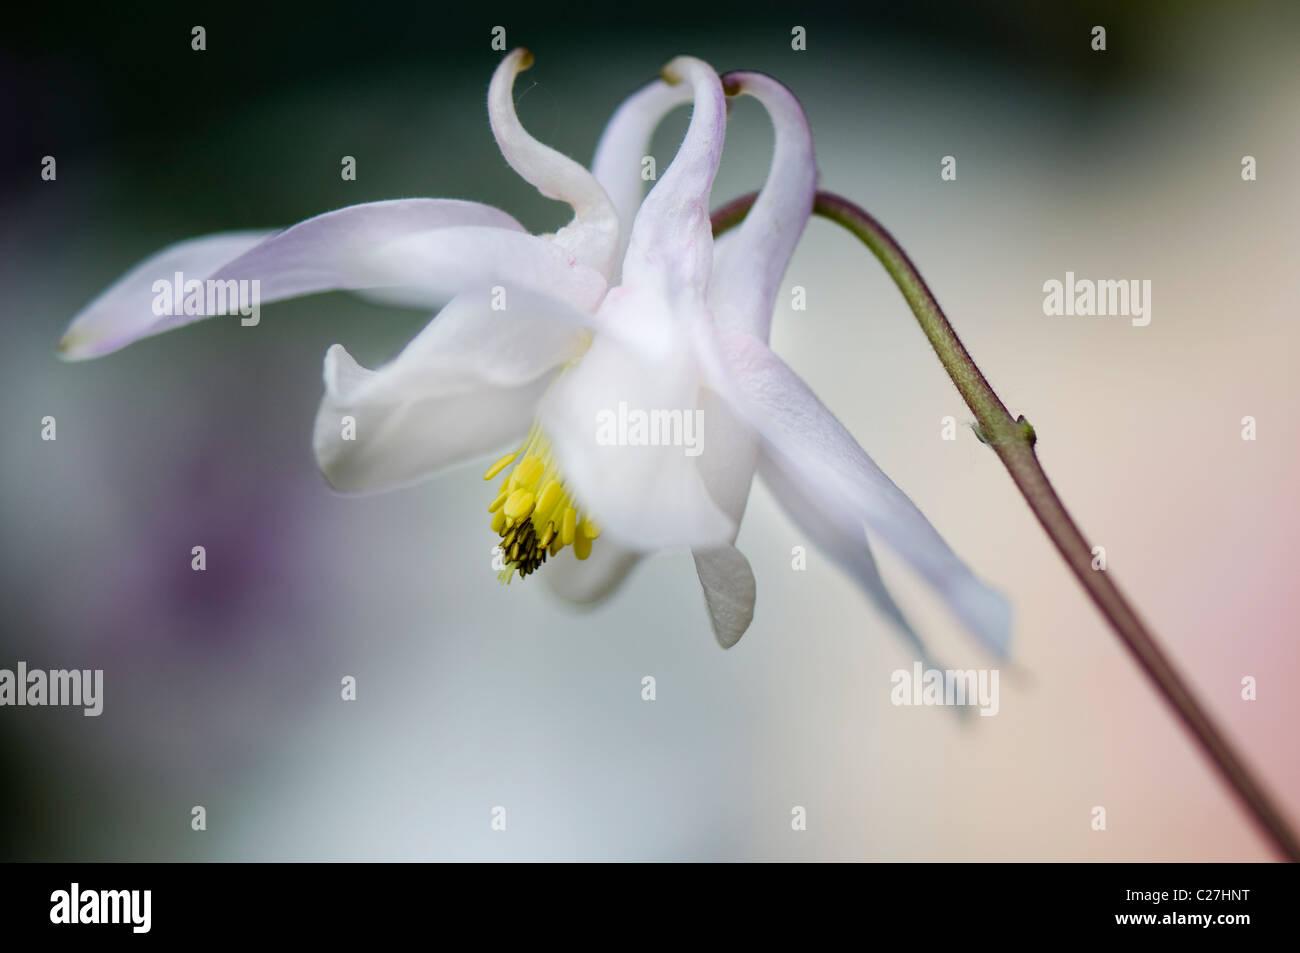 A single white Aquilegia vulgaris flower - columbine - Stock Image